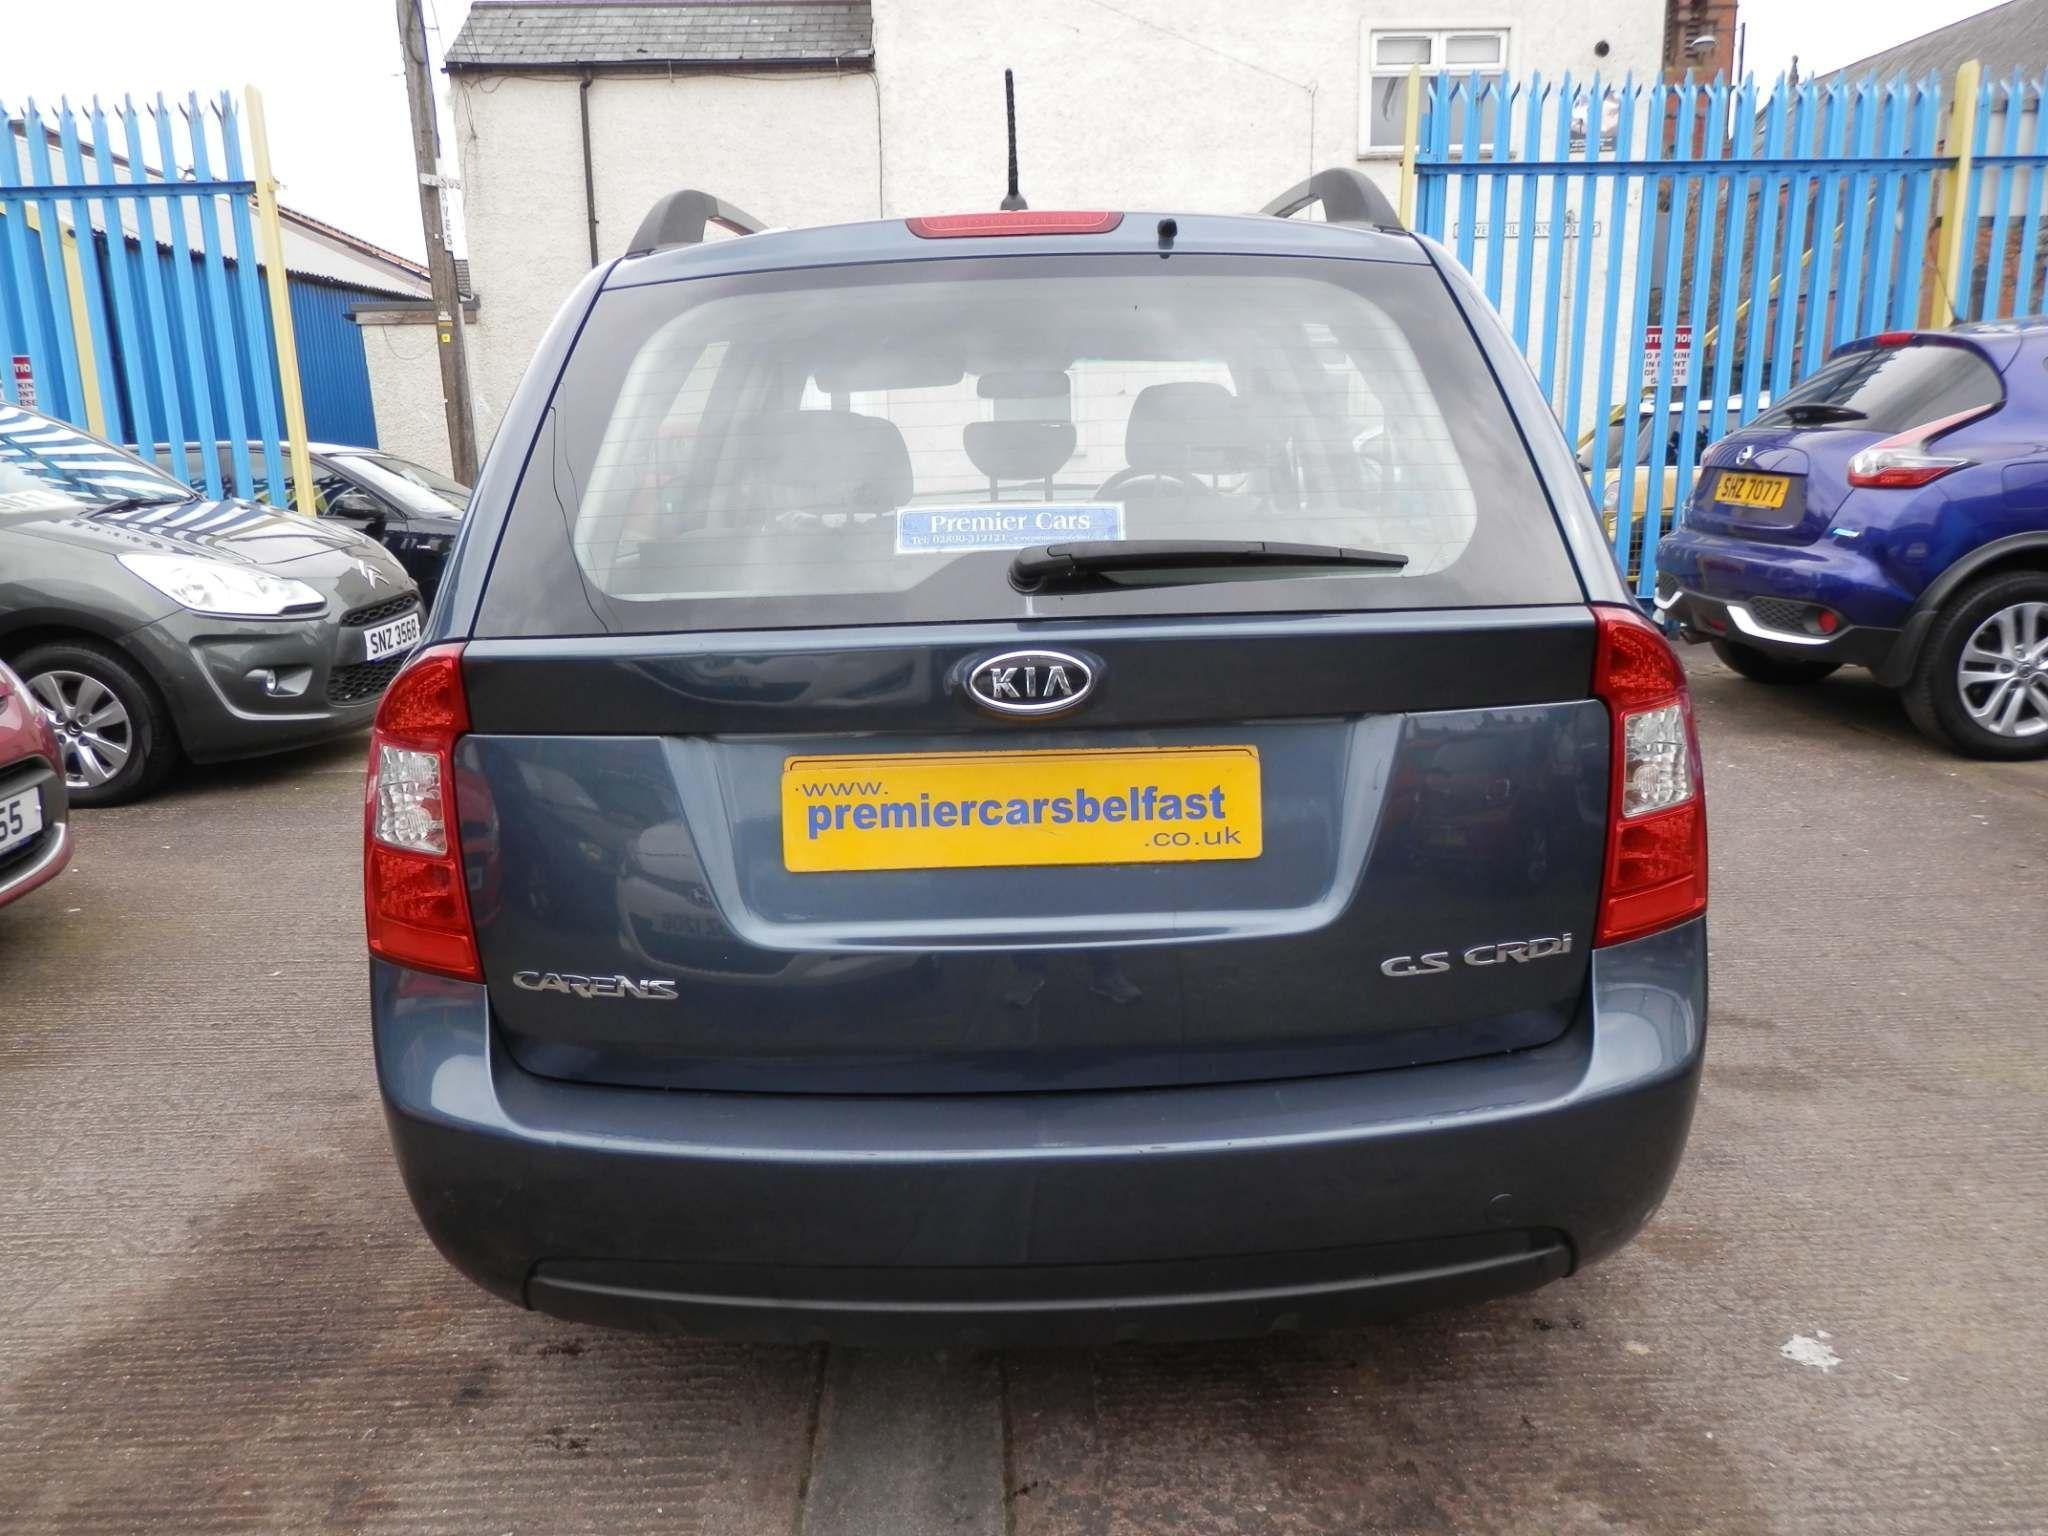 2010 KIA Carens 2.0 CRDi GS  (7 Seats) Diesel Manual  – Premier Cars Belfast Belfast full